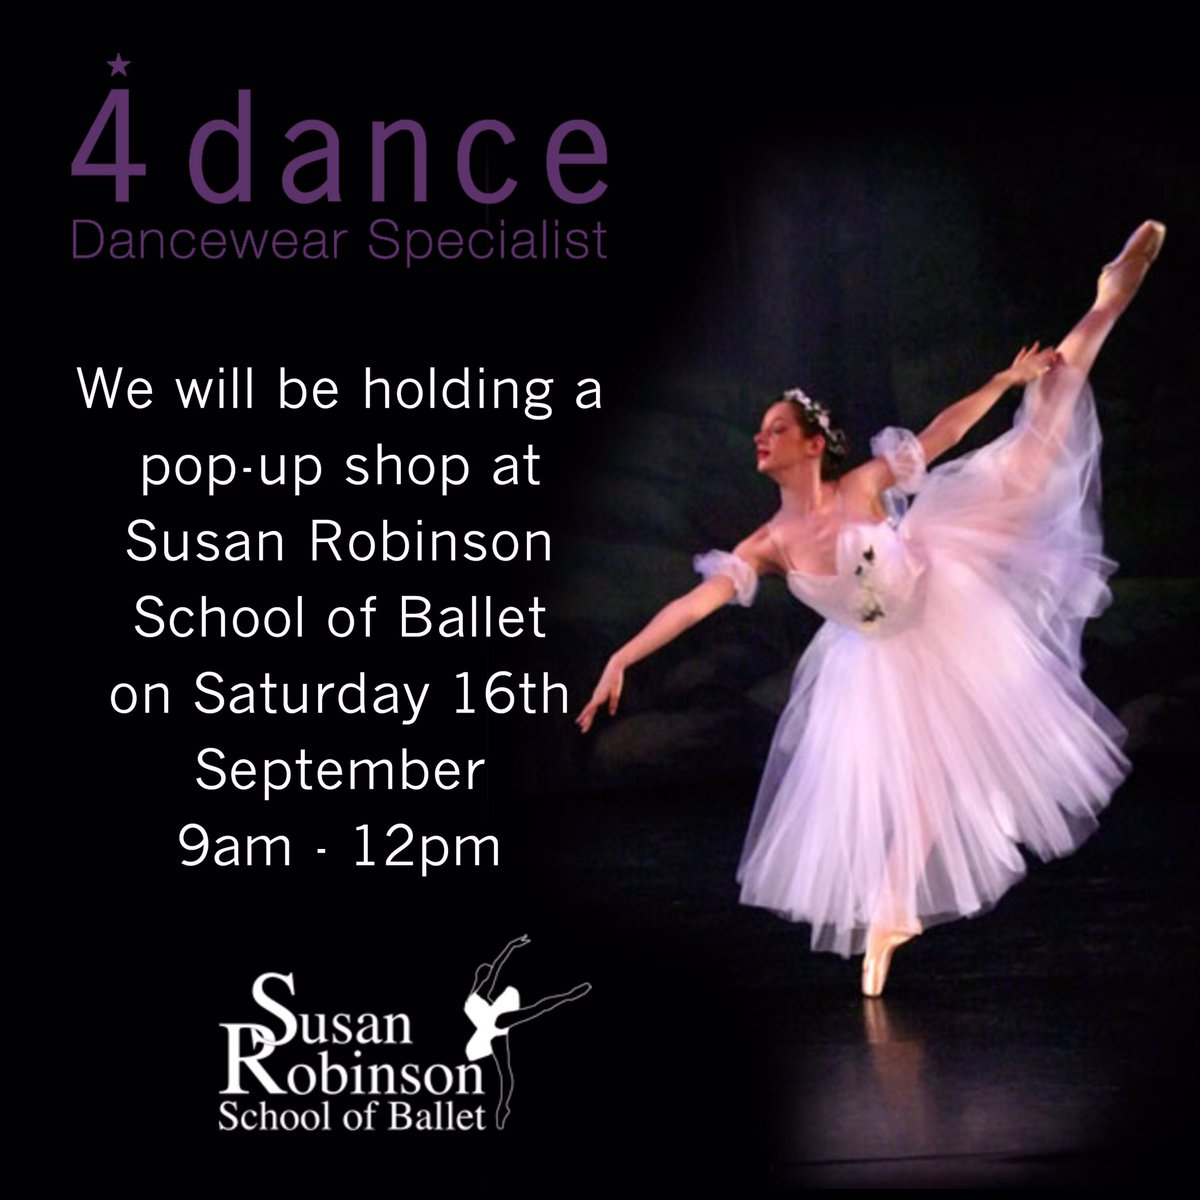 4 dance Dancewear (@4dance_UK) | Twitter